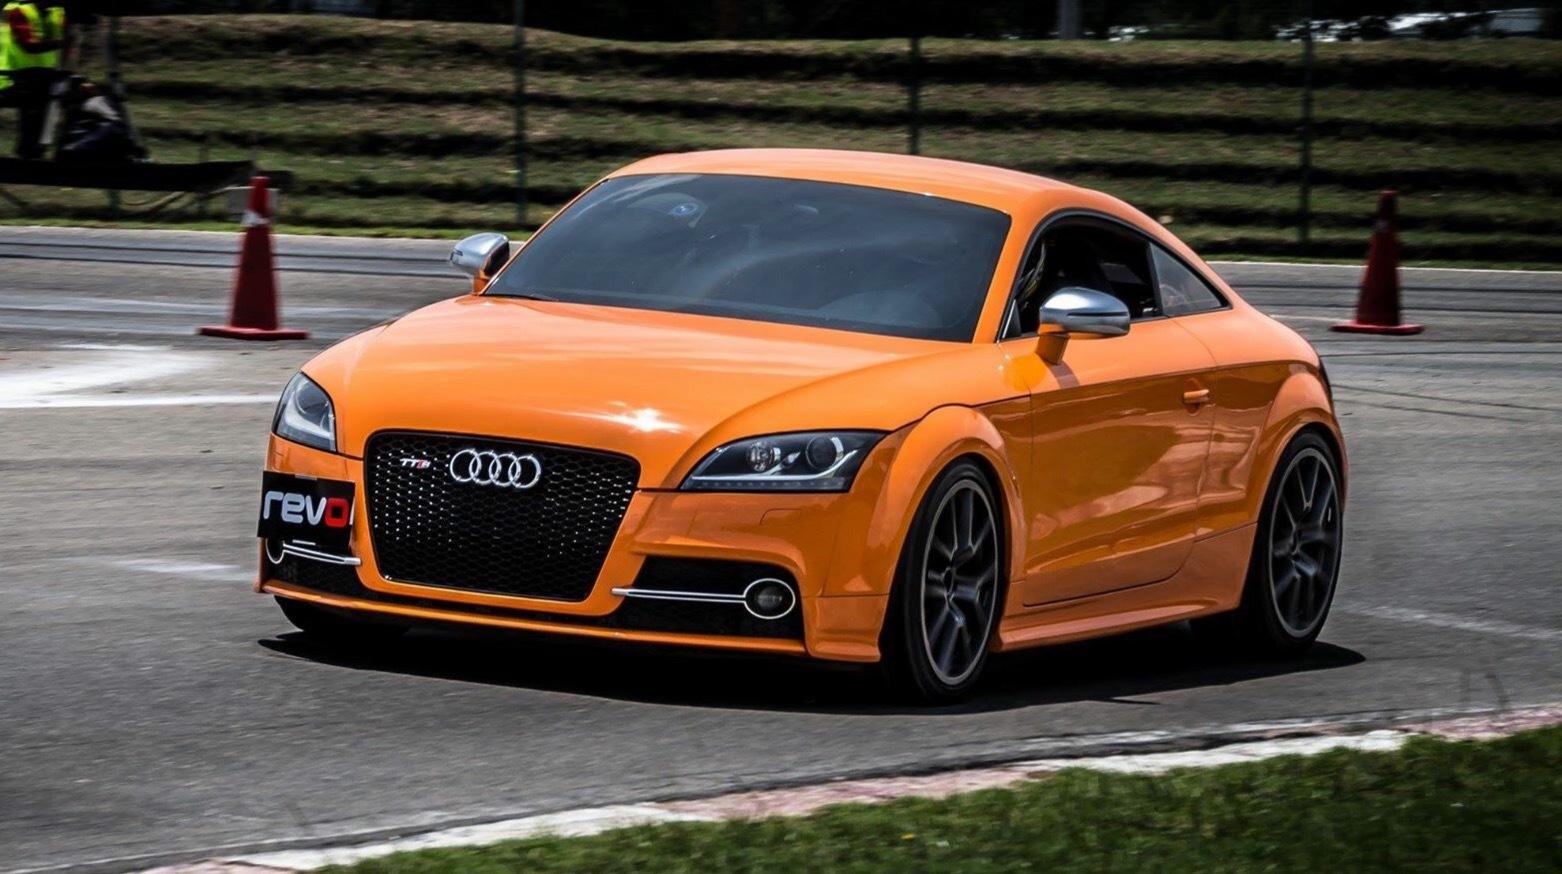 Kekurangan Audi Tt 2012 Murah Berkualitas